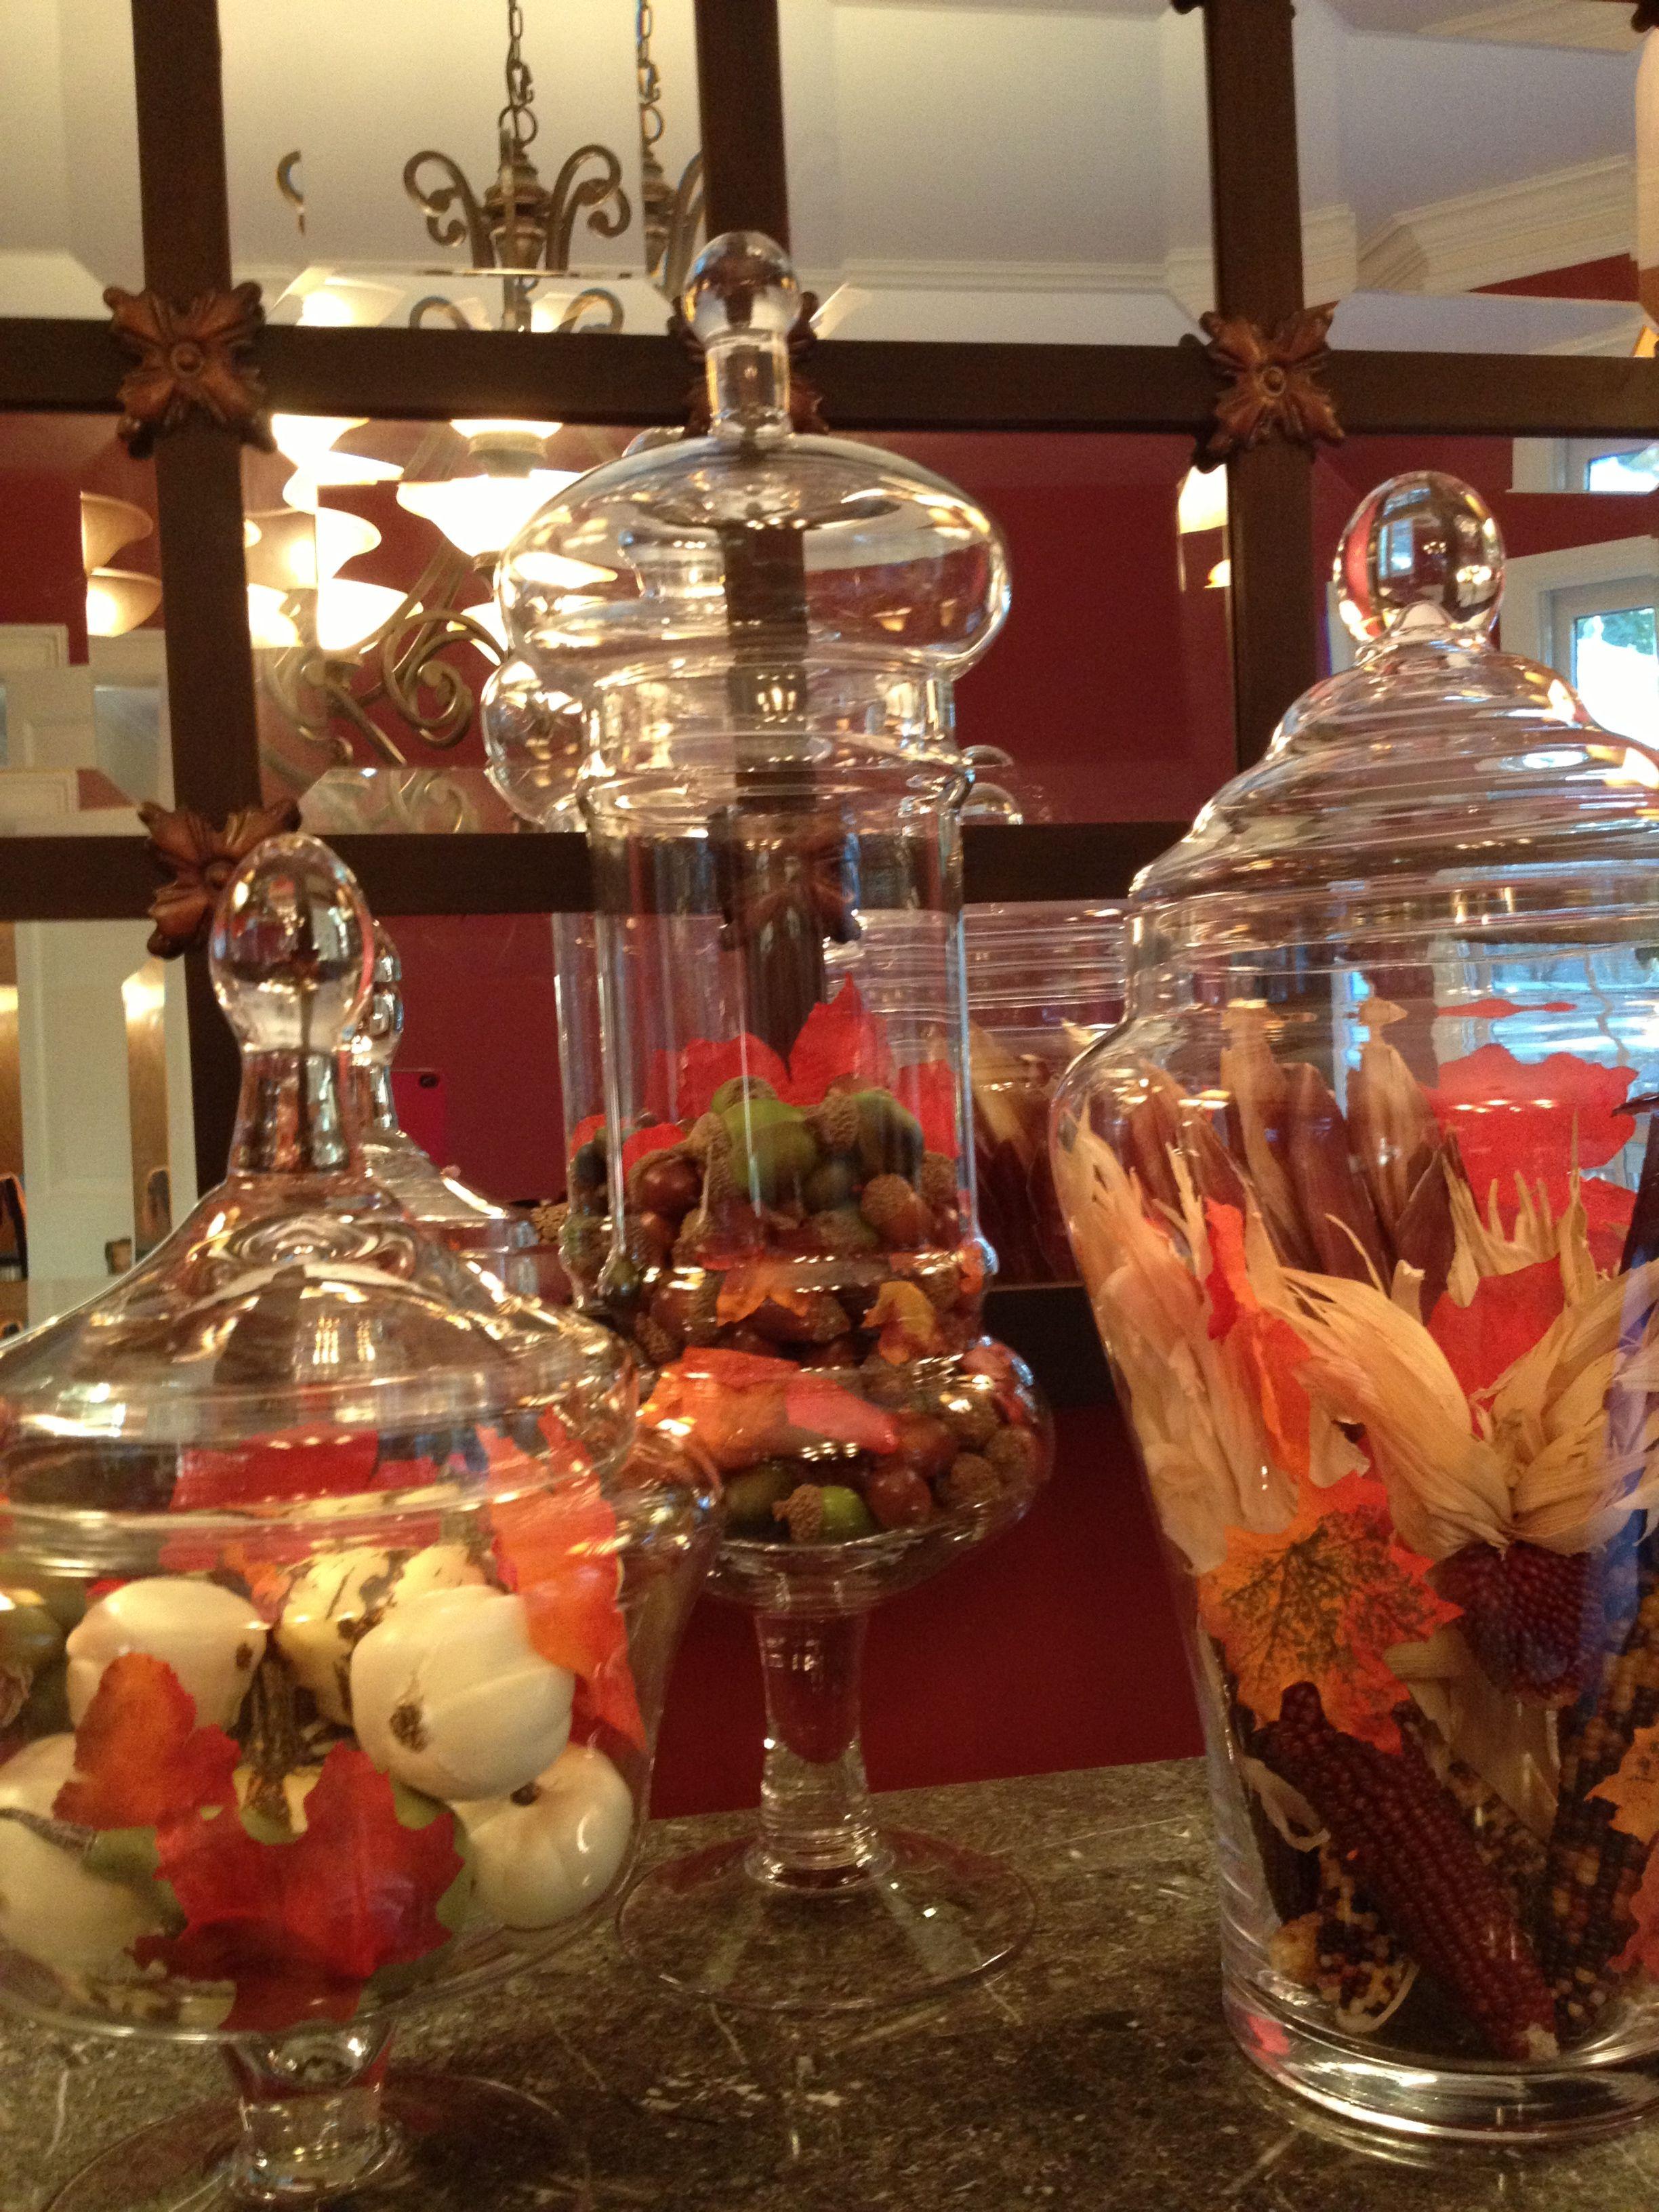 Fall Apothecary Jars Fall Apothecary Jars Apothecary Jars Decor Harvest Decorations